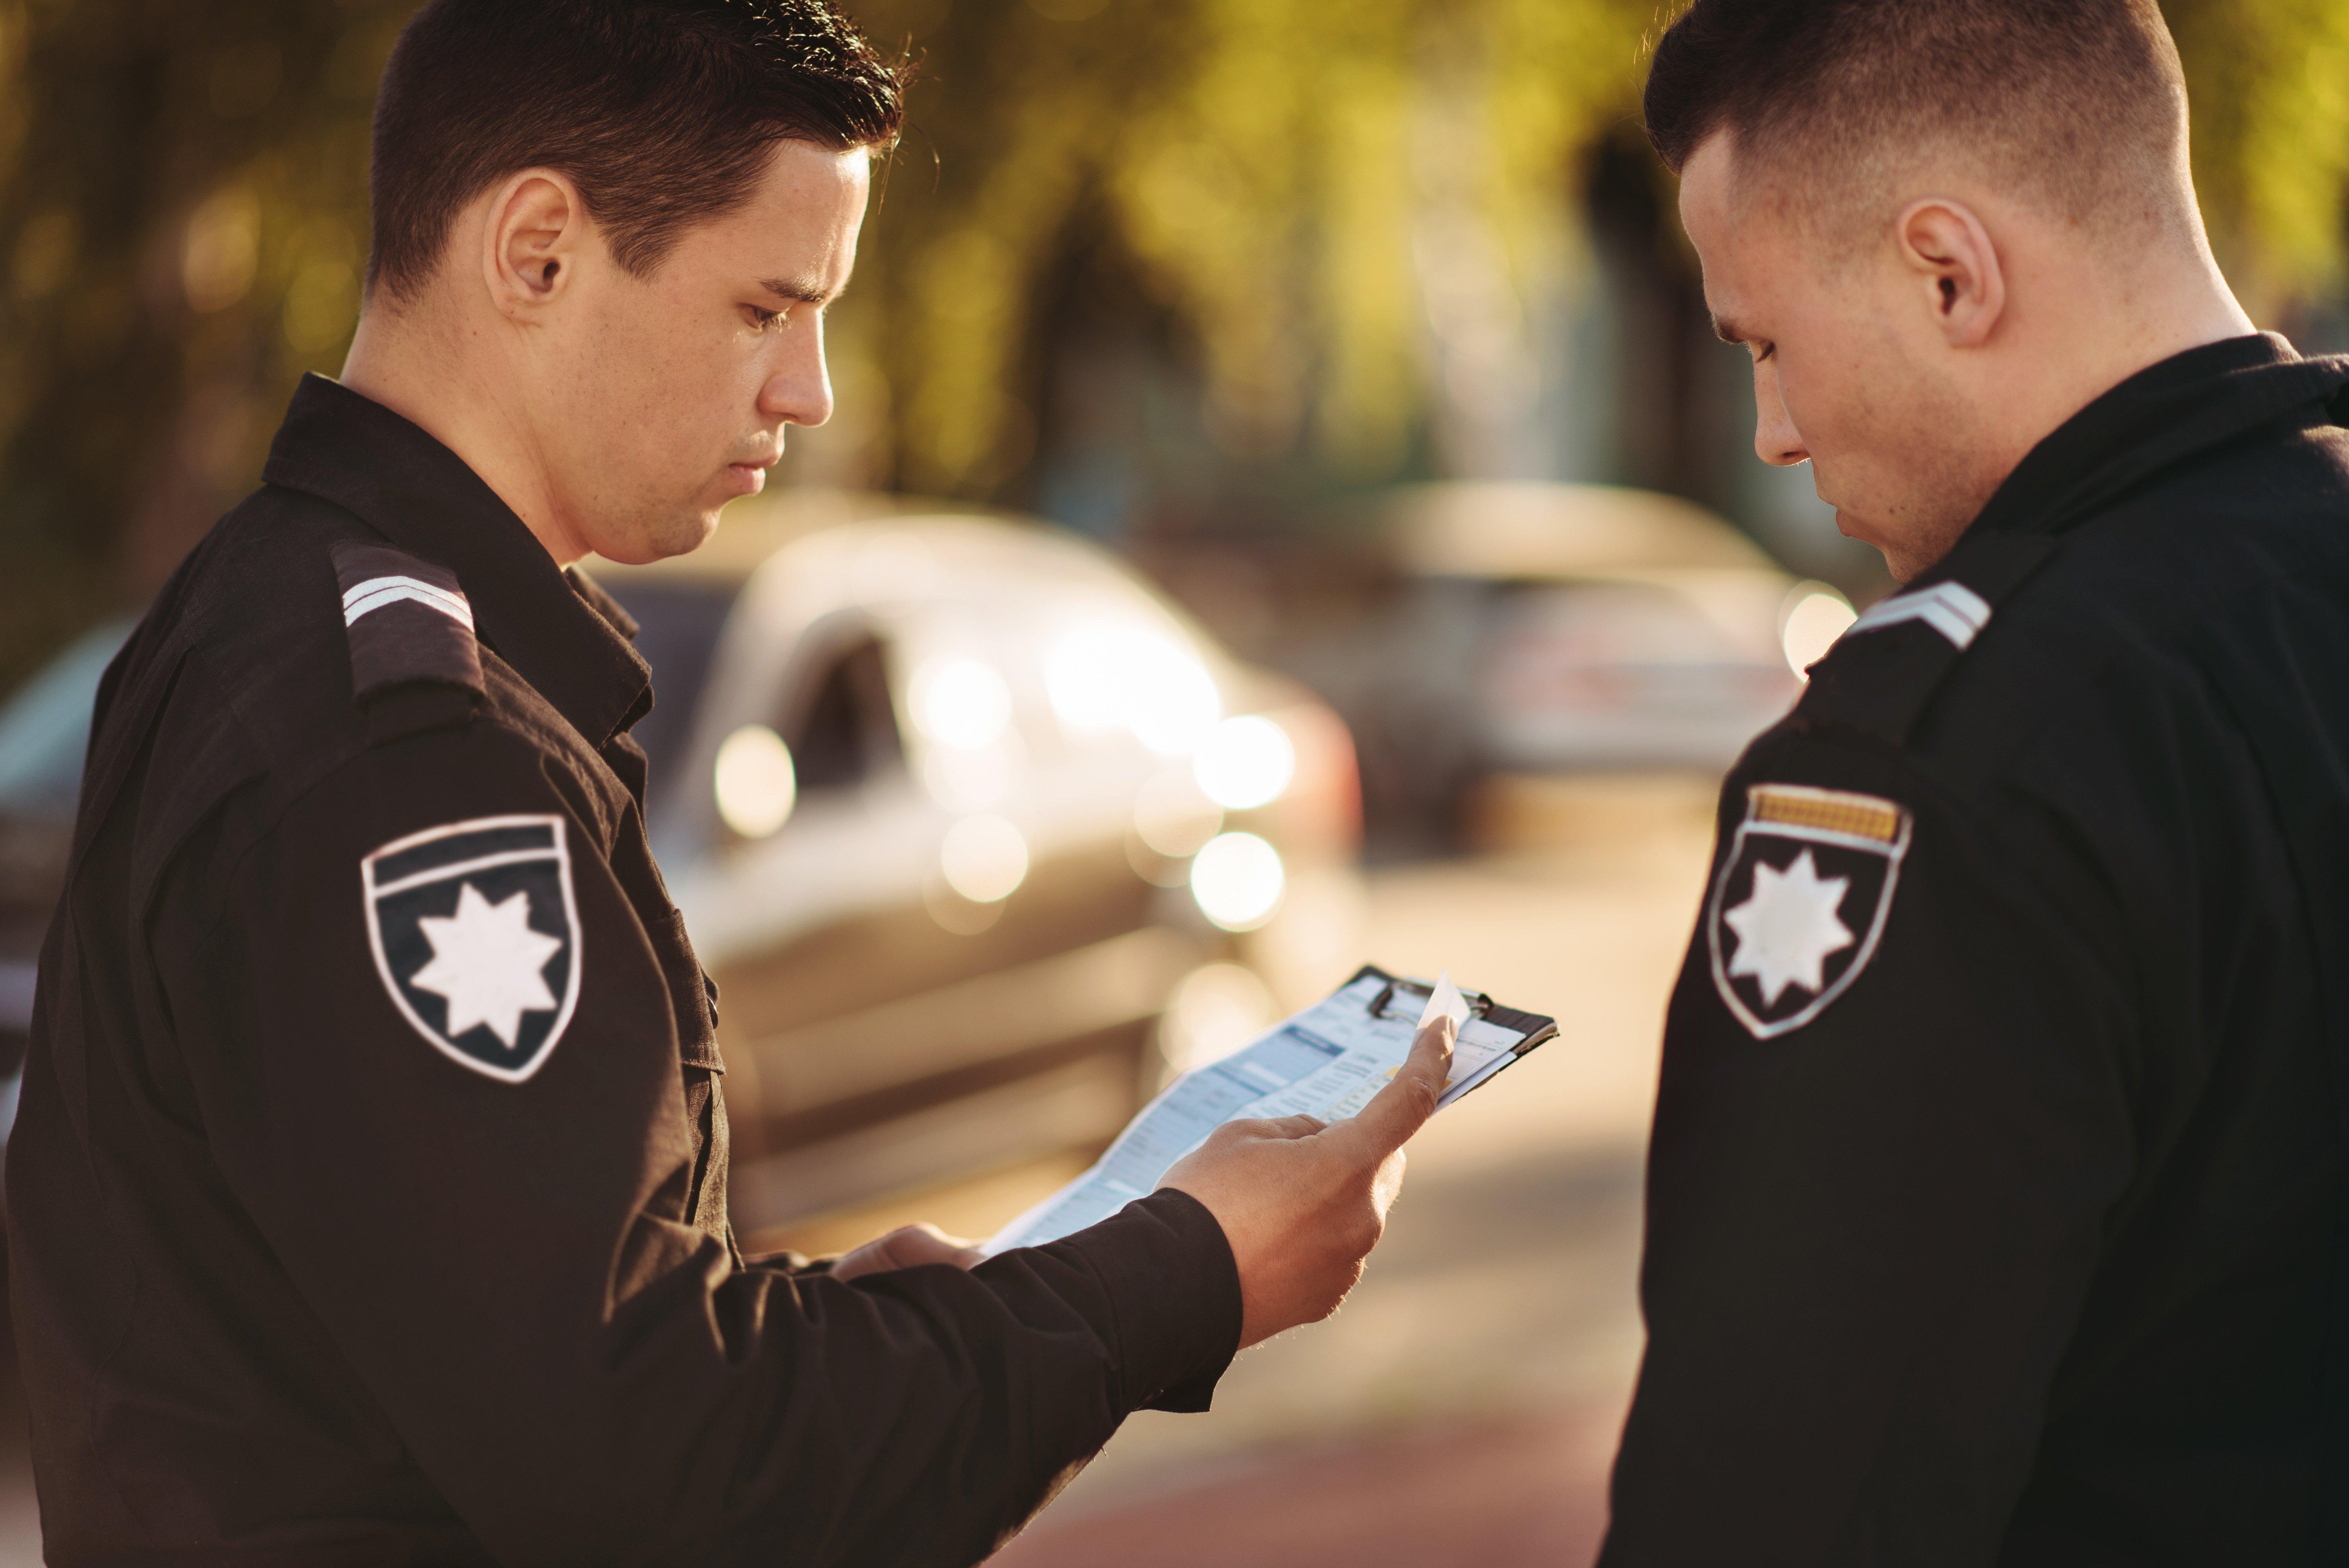 cops-in-uniform-stop-the-car-on-road-R6GCKF7